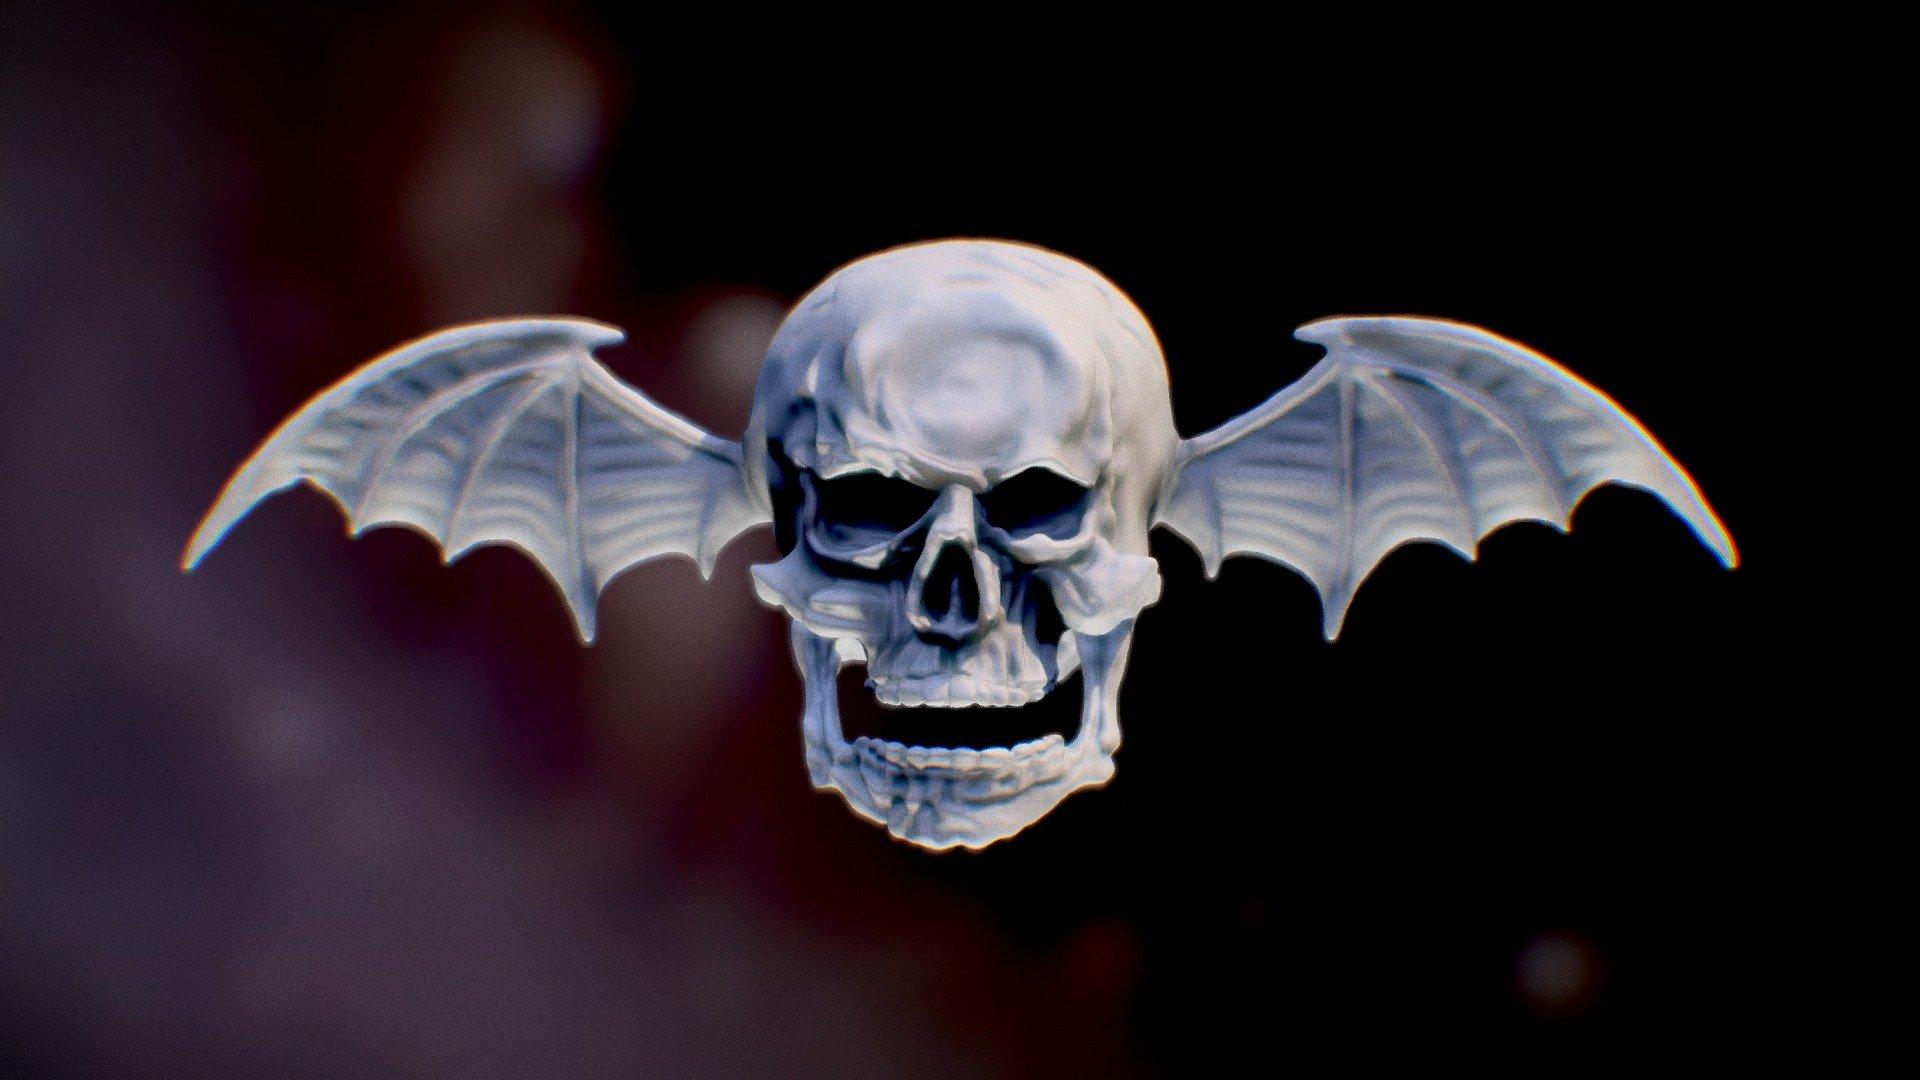 Deathbat Avenged Sevenfold 3d Model By Yuriy Sountsov